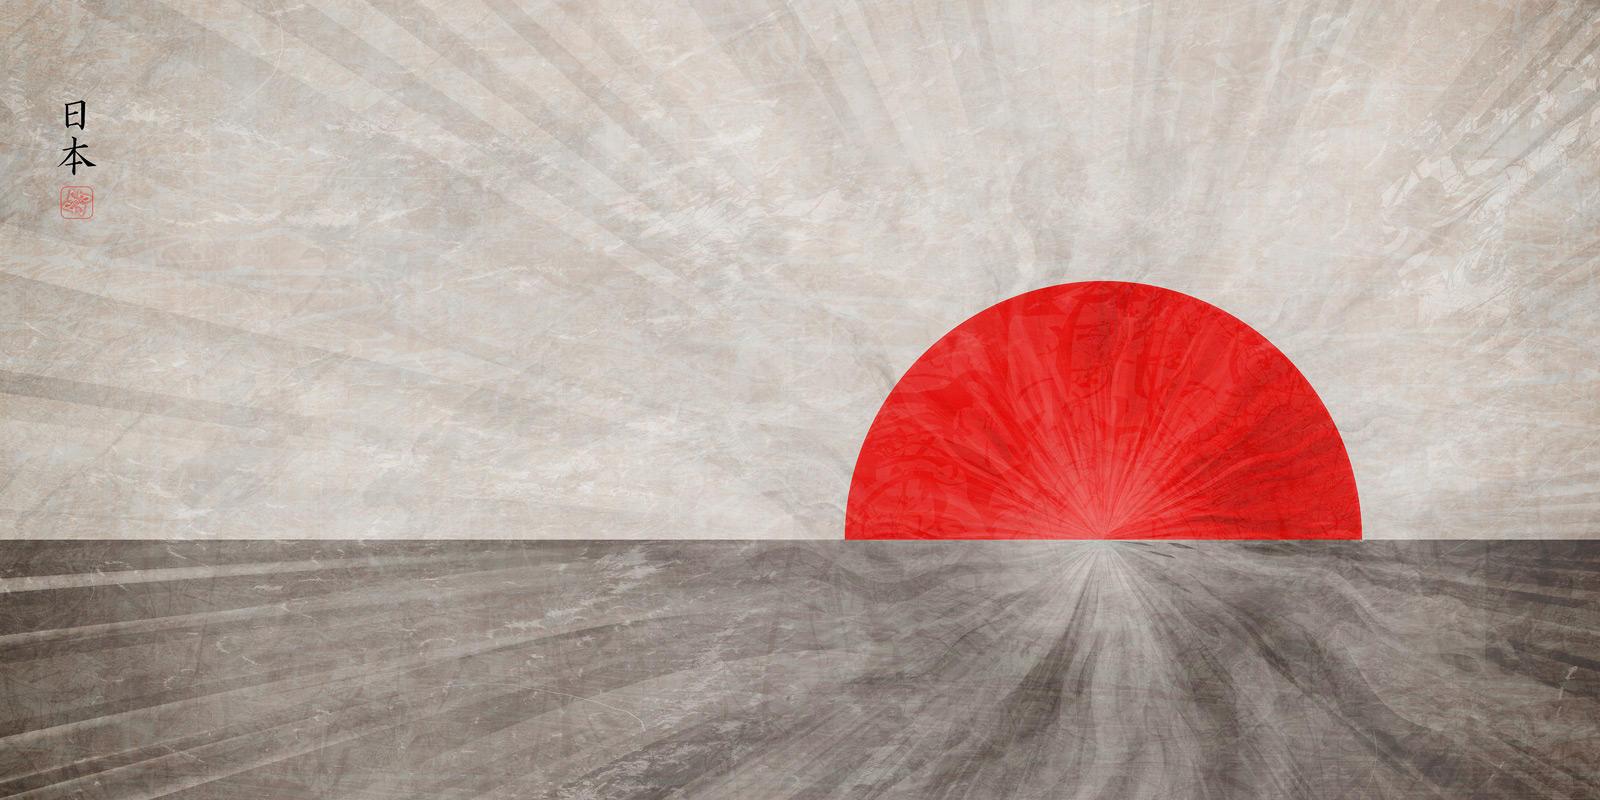 -Nihon- by silwenka